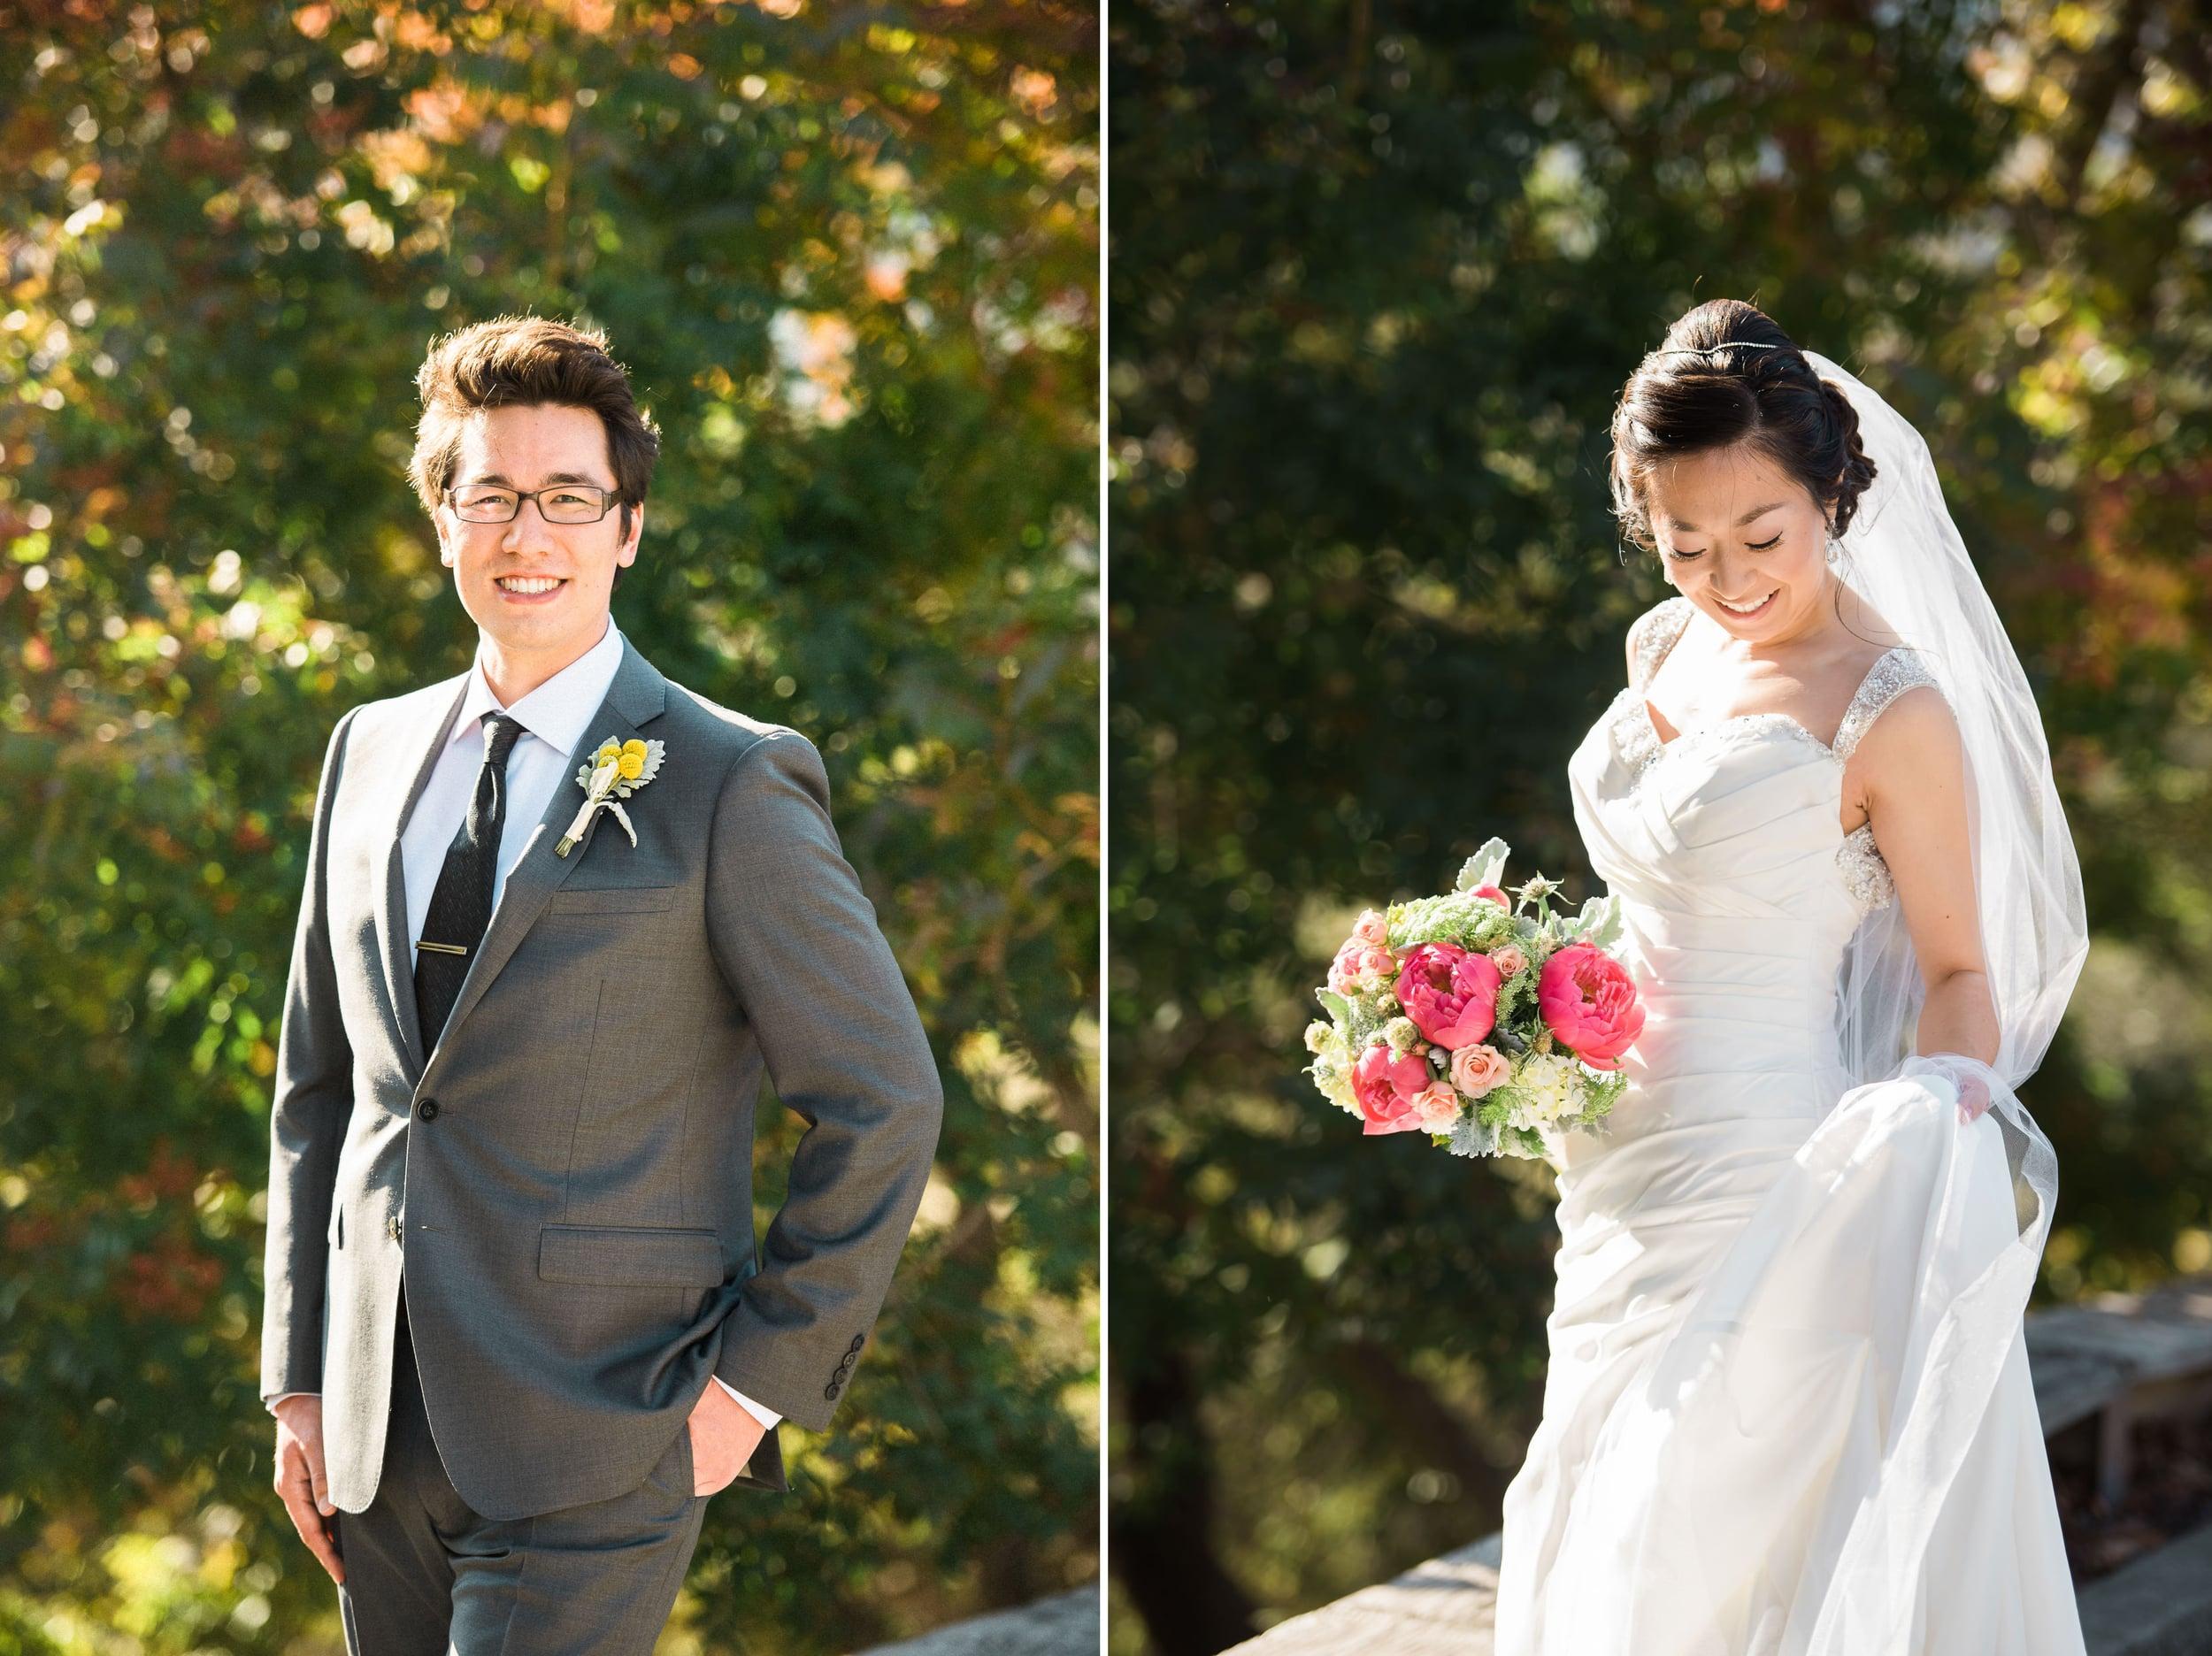 Moraga Valley Church wedding 016.jpg